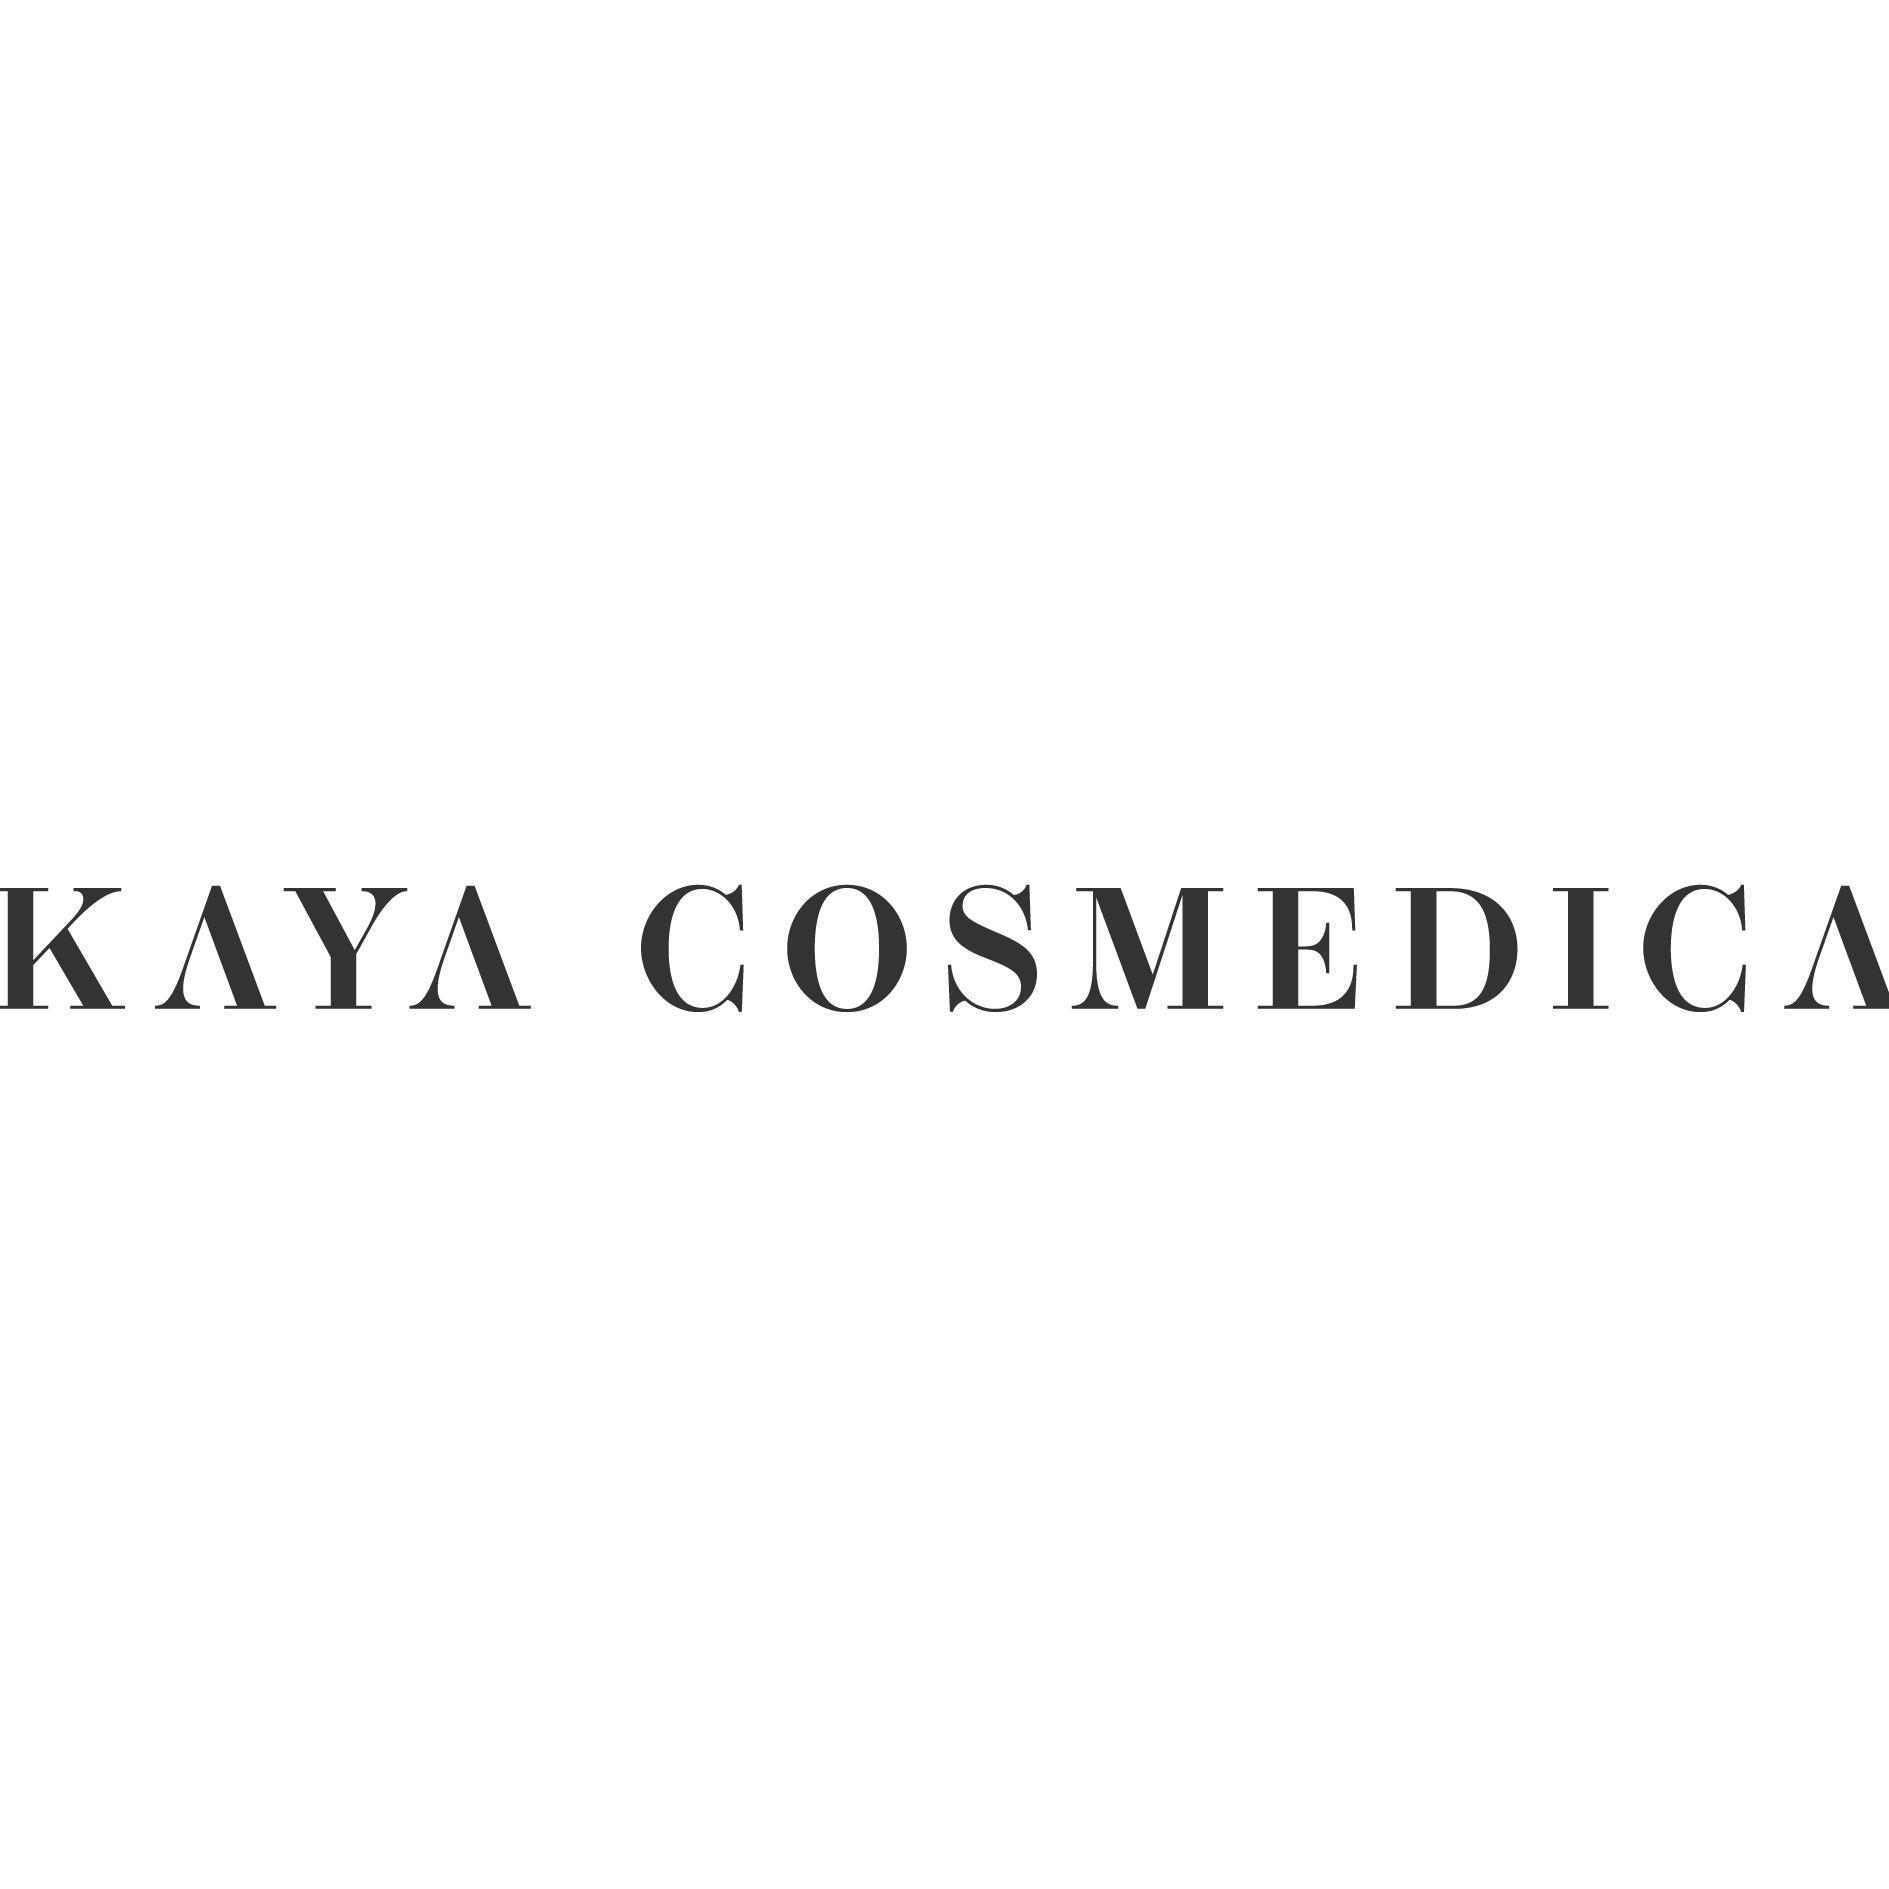 Kaya Cosmedica